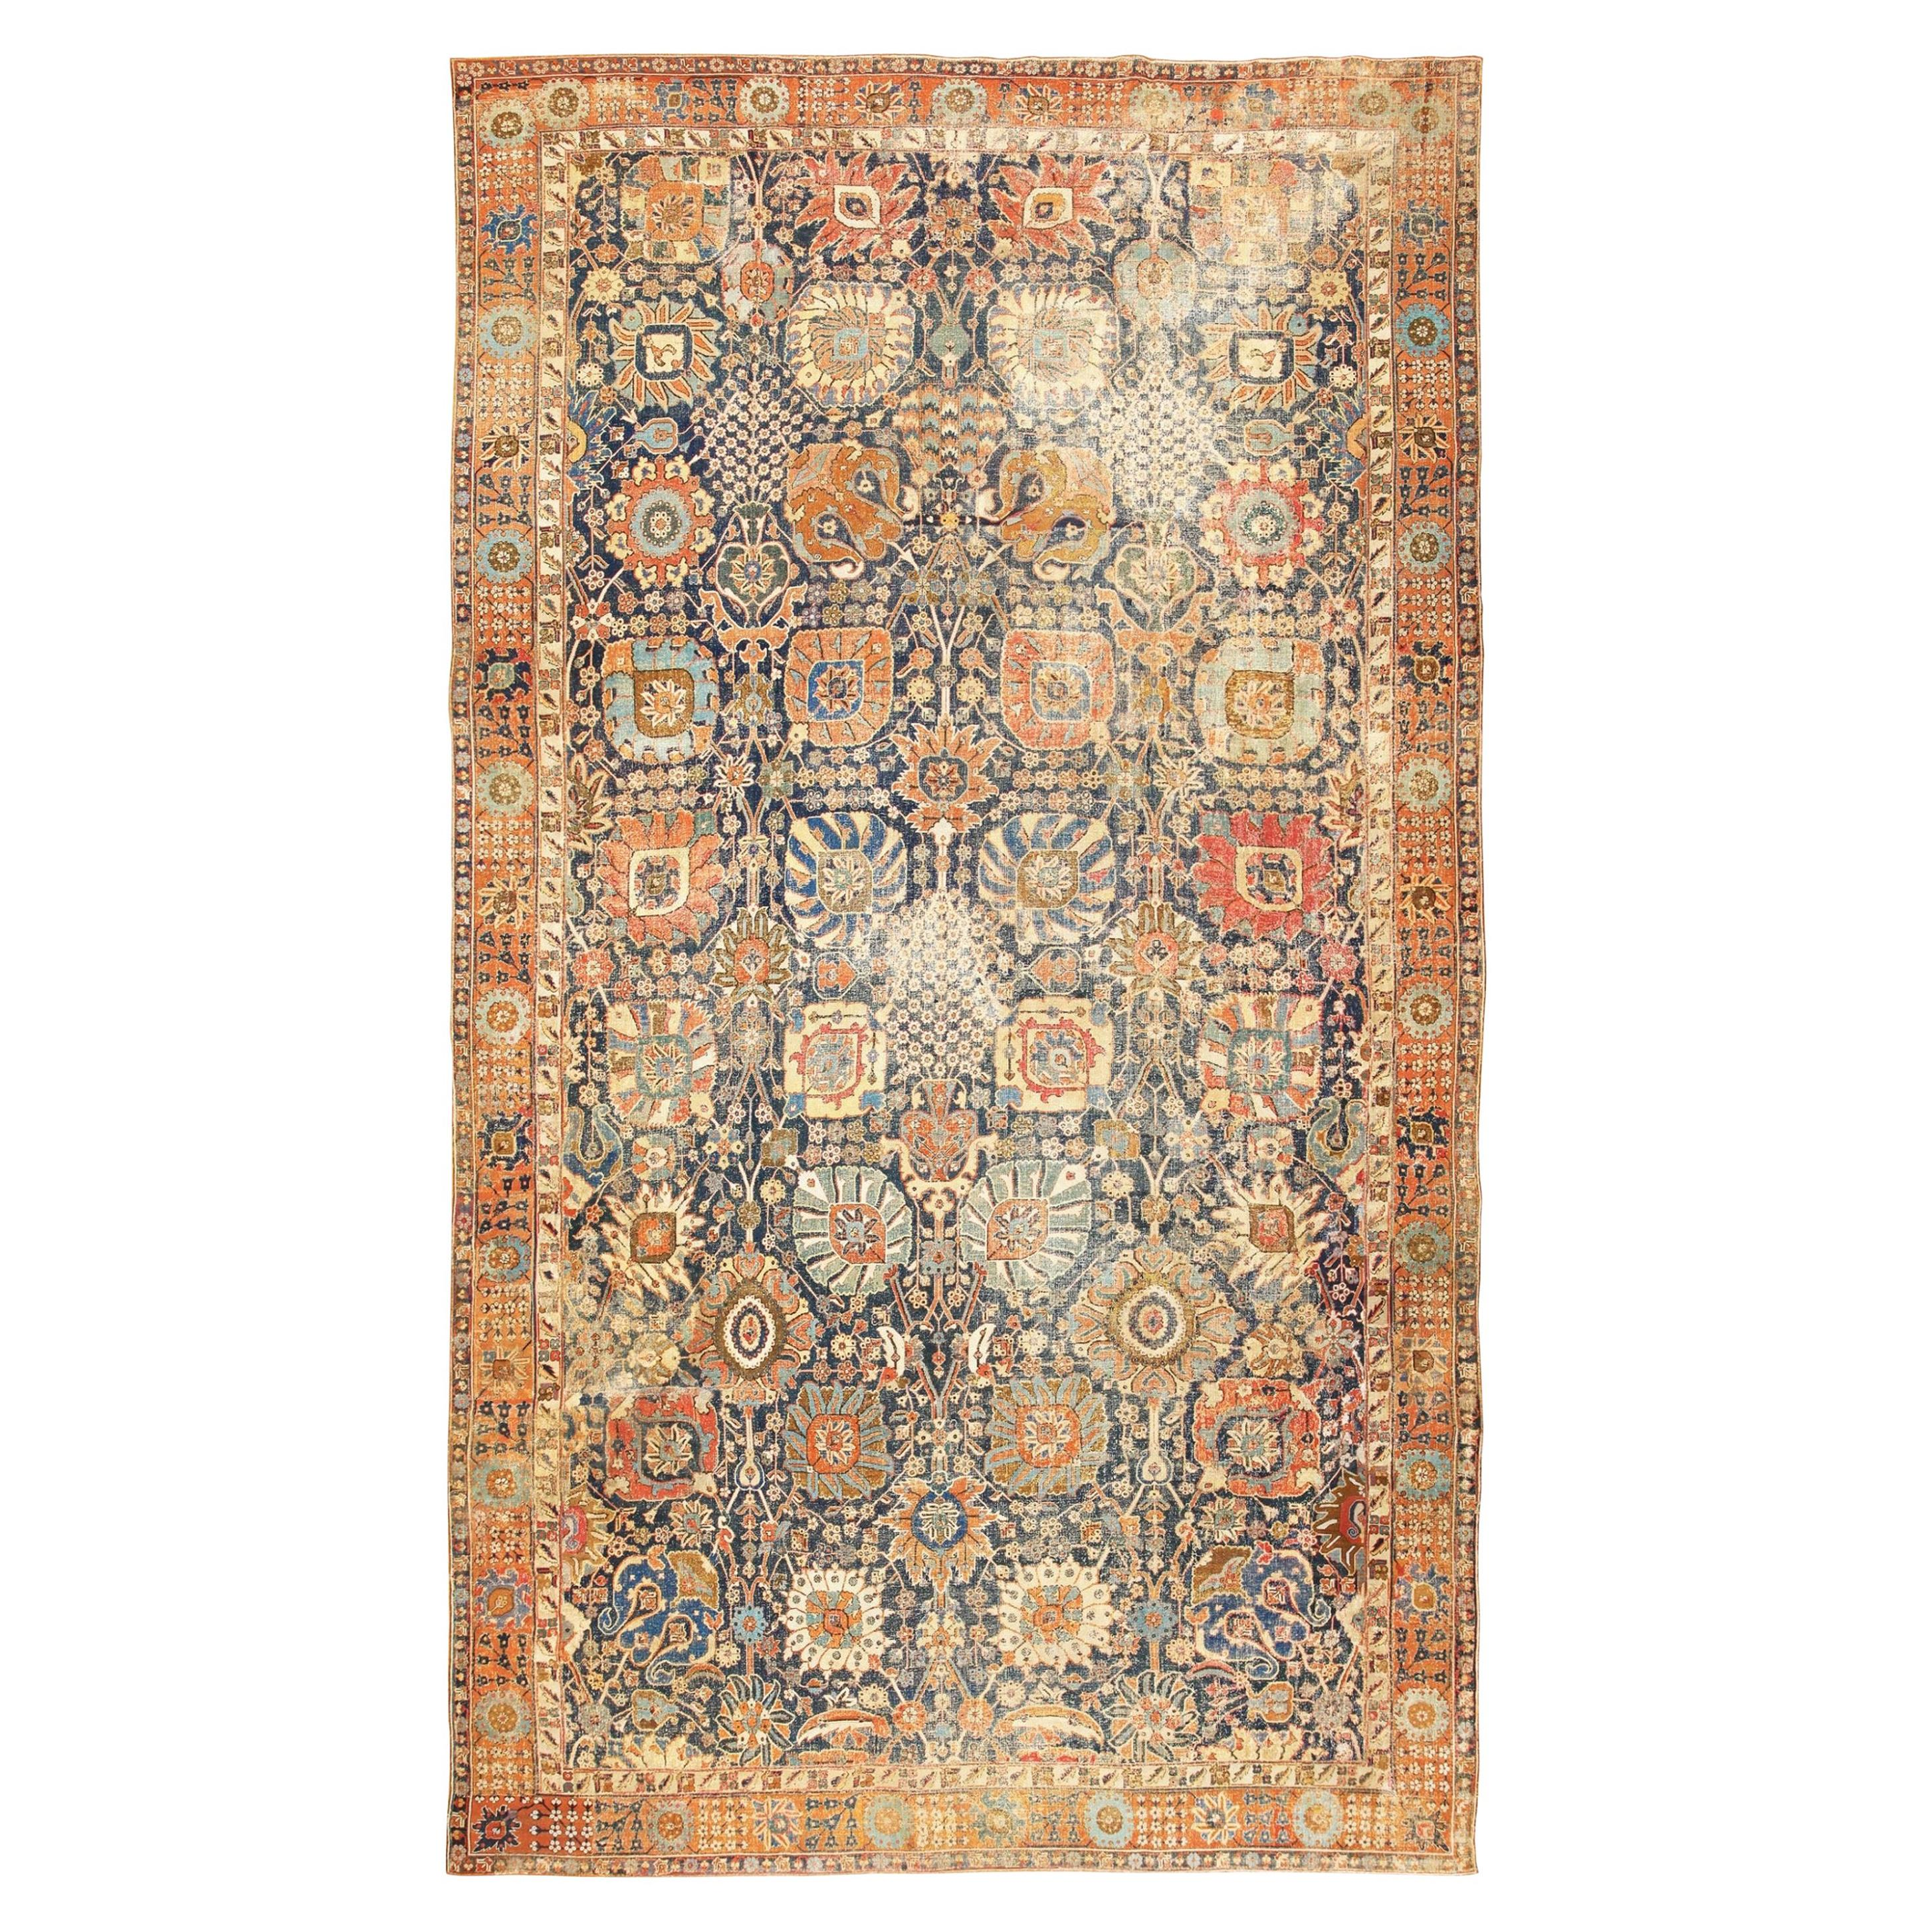 Antique 17th Century Persian Vase Kerman Carpet. Size: 11 ft 5 in x 20 ft 2 in